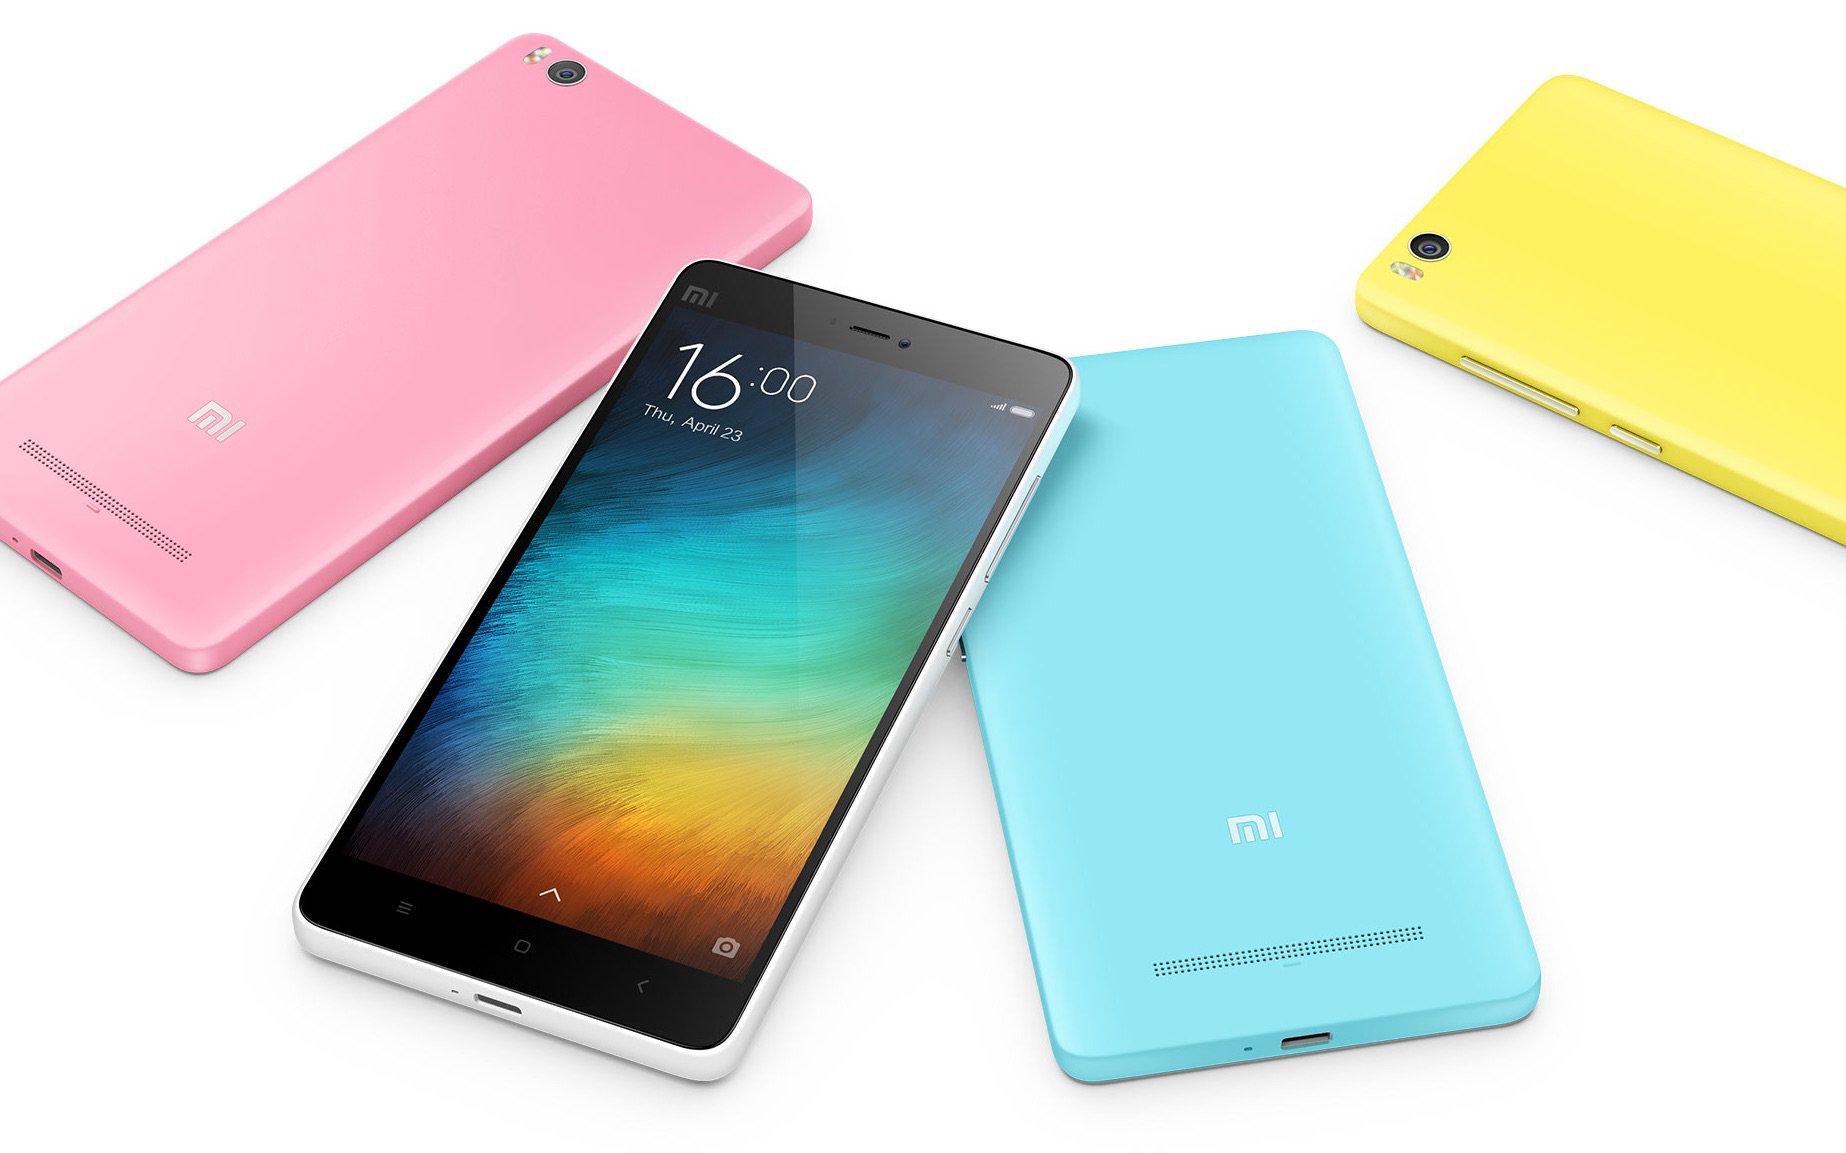 Xiaomi mi phone 600